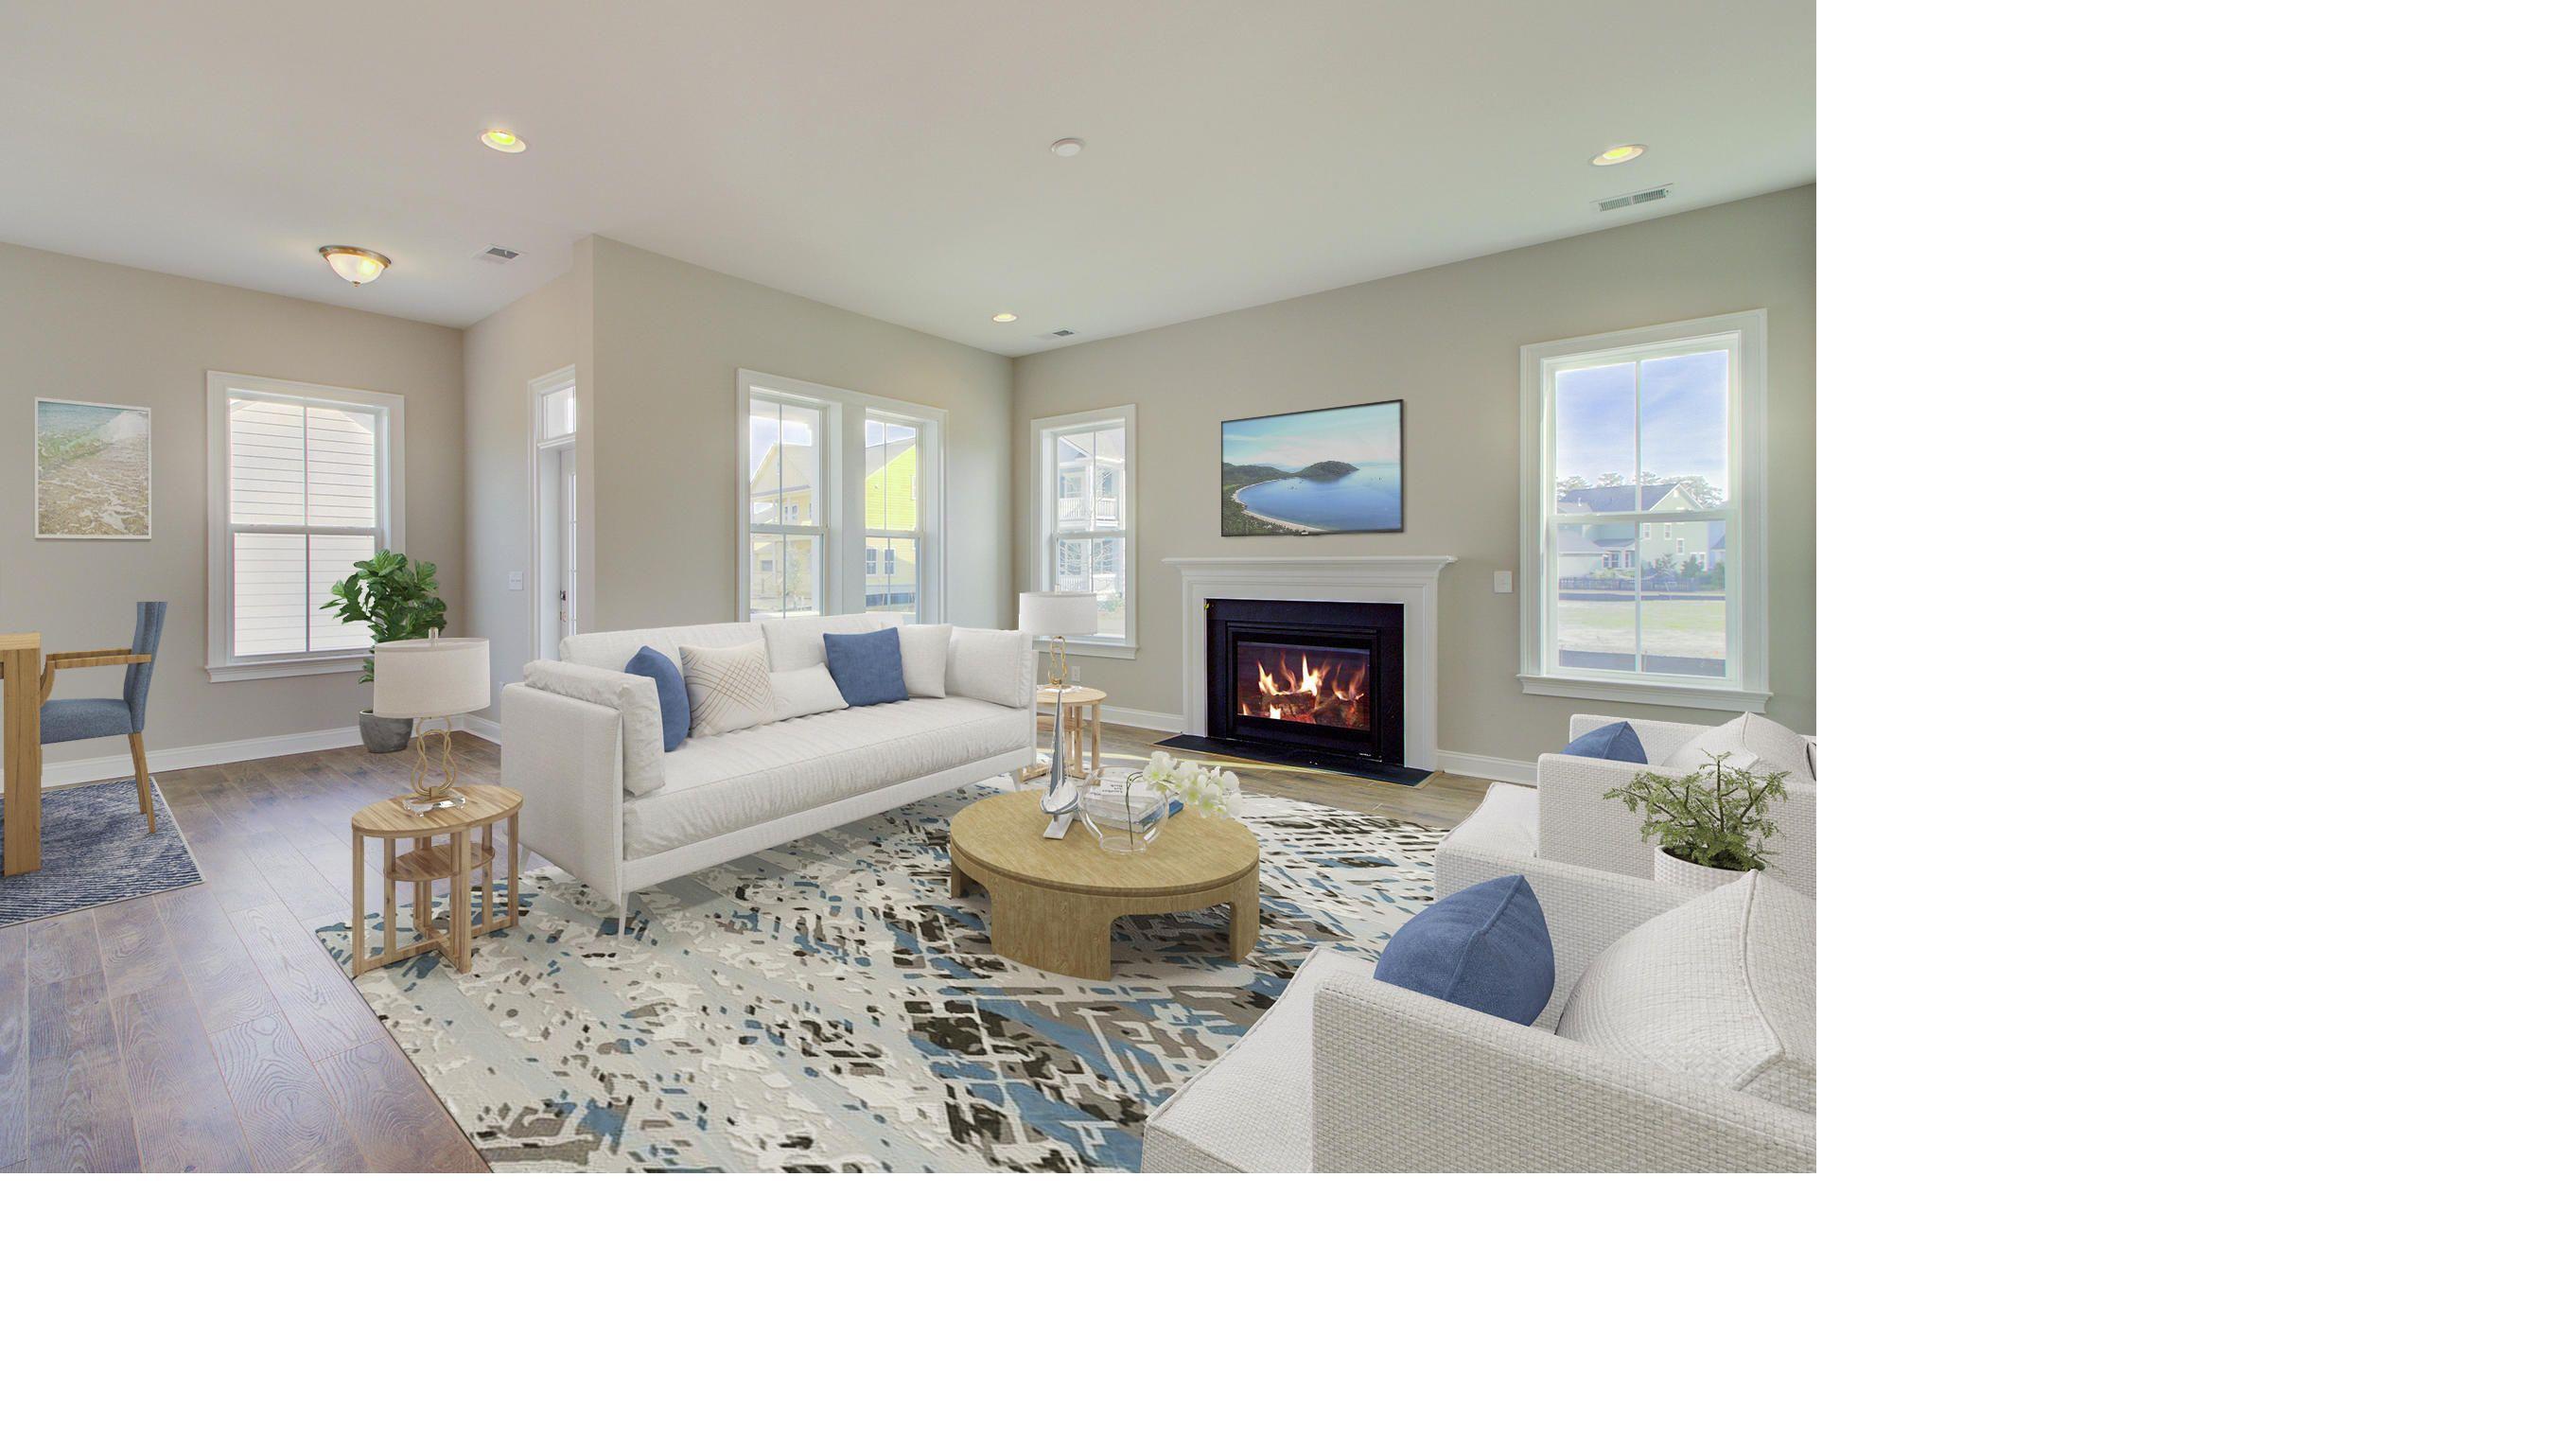 Carolina Park Homes For Sale - 1762 Sandybrook, Mount Pleasant, SC - 1